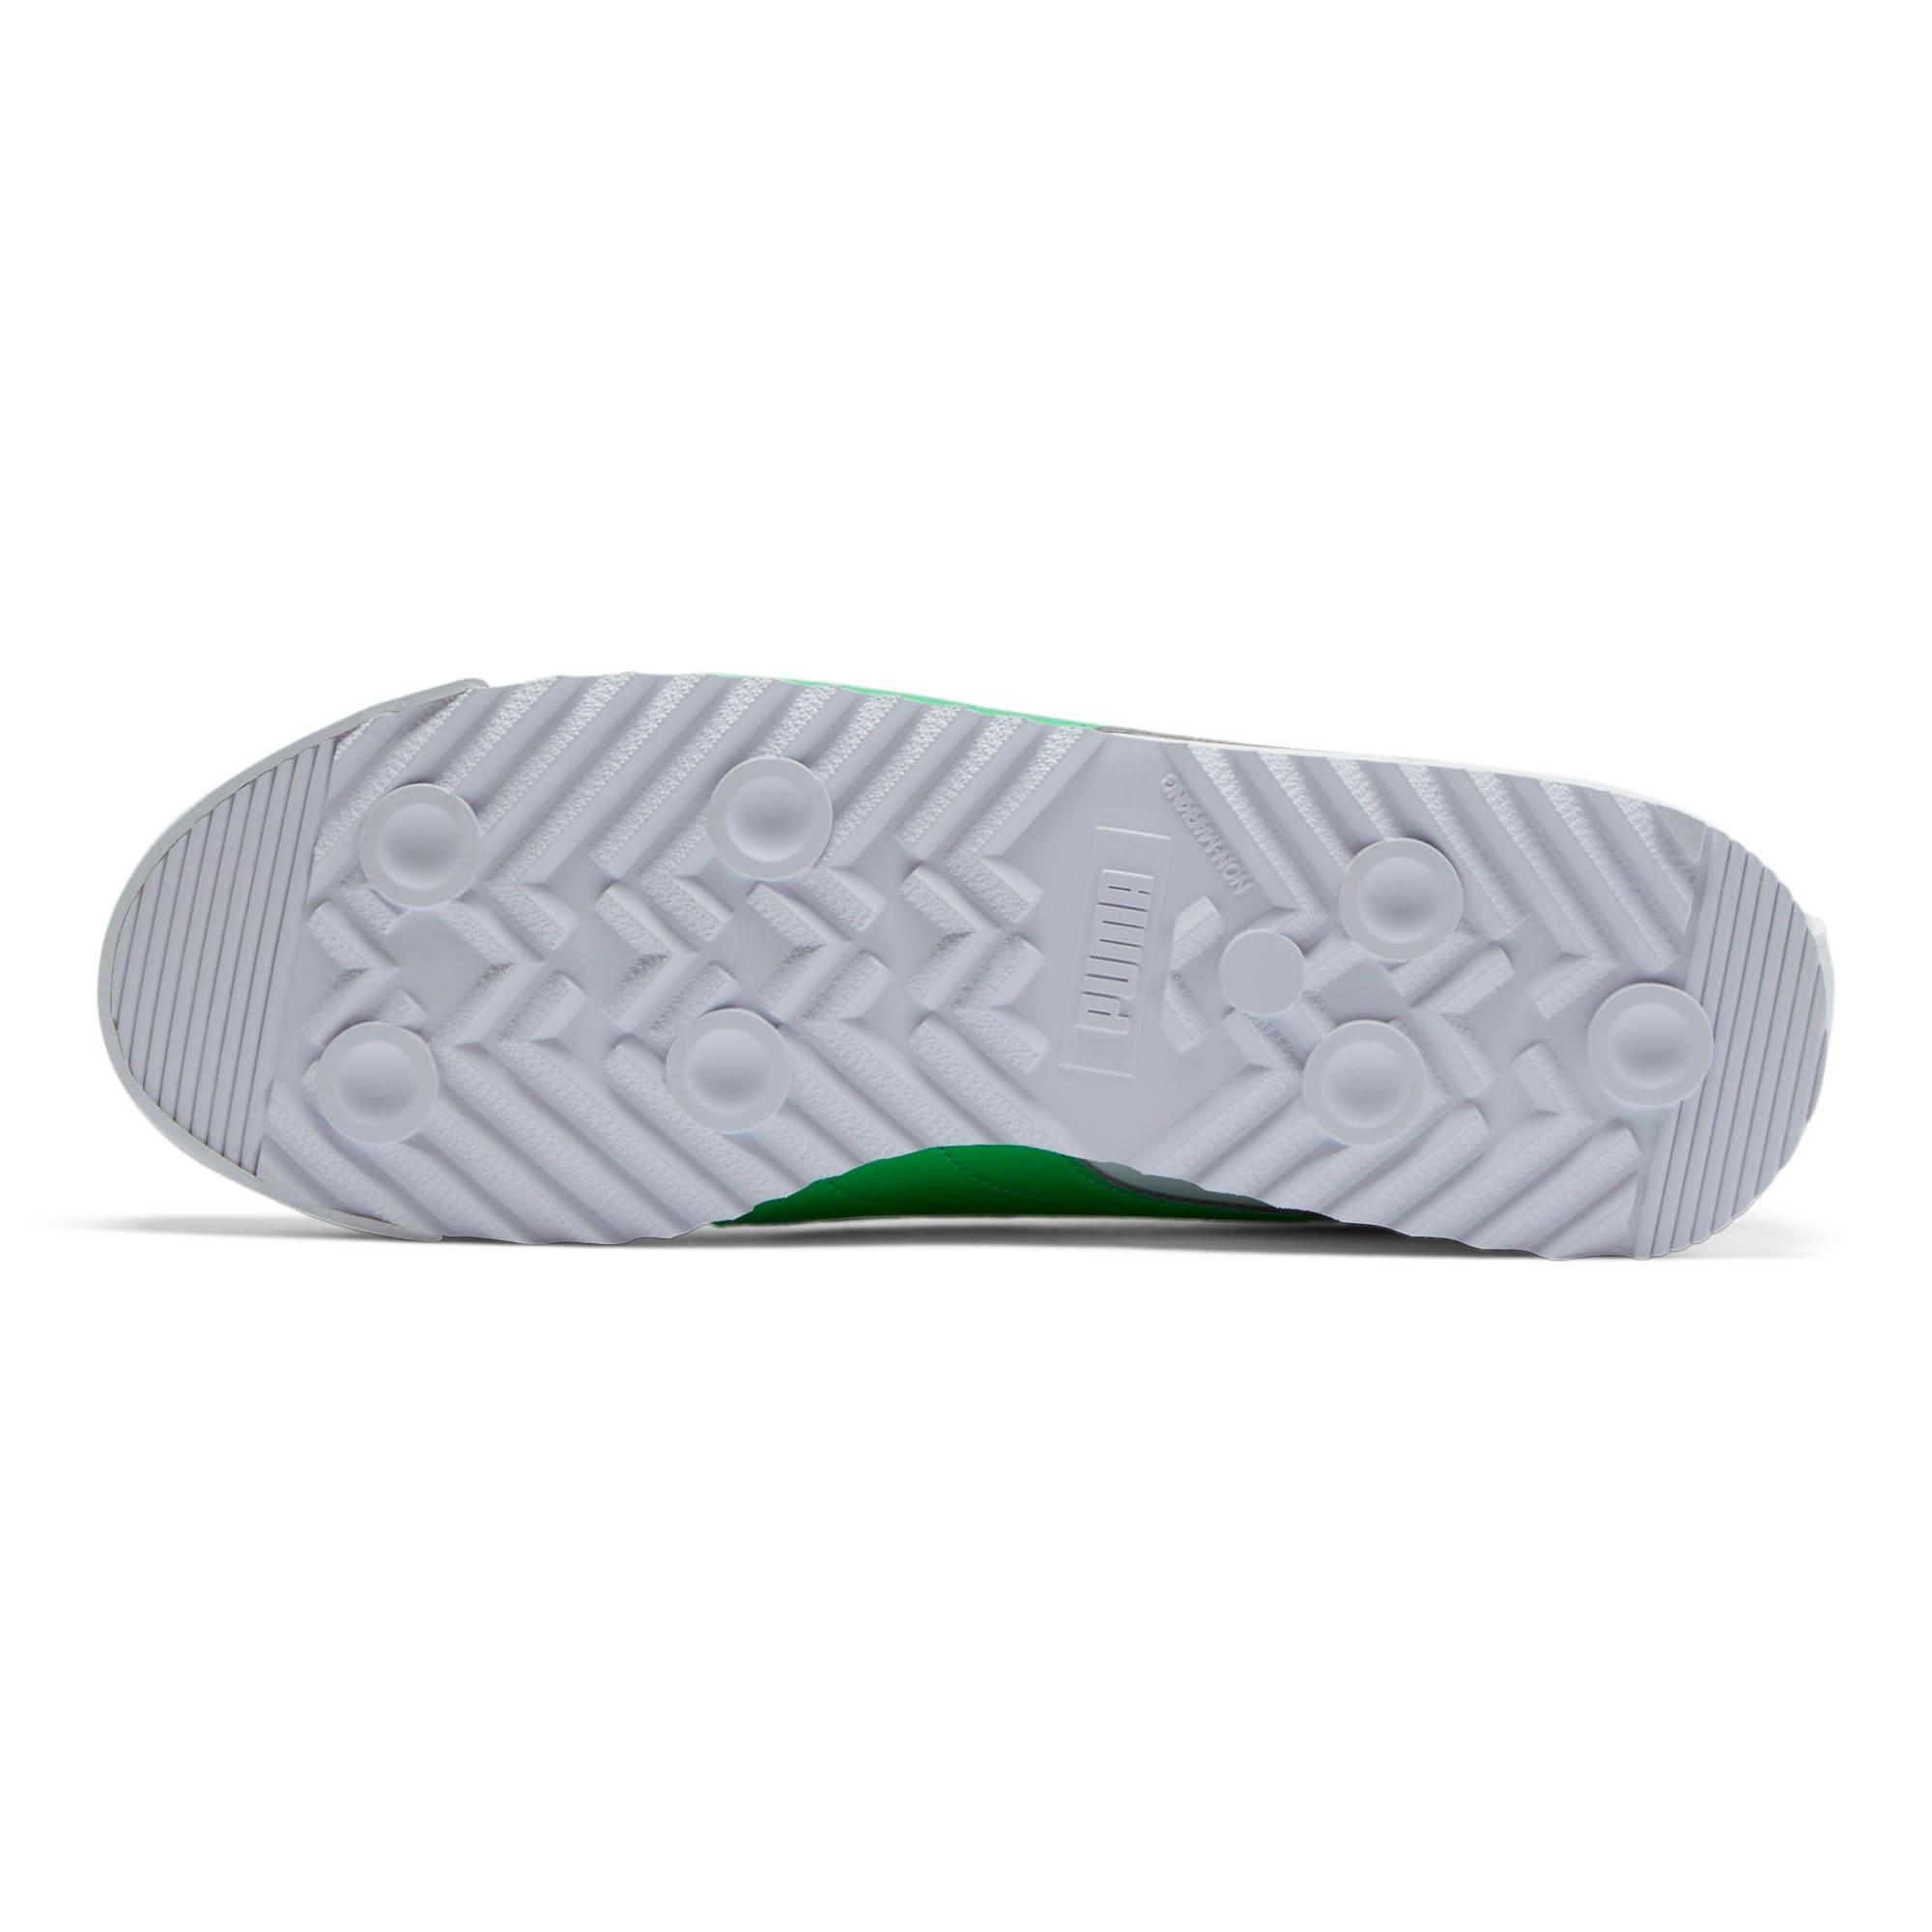 Miniatura 4 de Zapatos deportivos Roma Basic +, Puma White-Irish Green, mediano